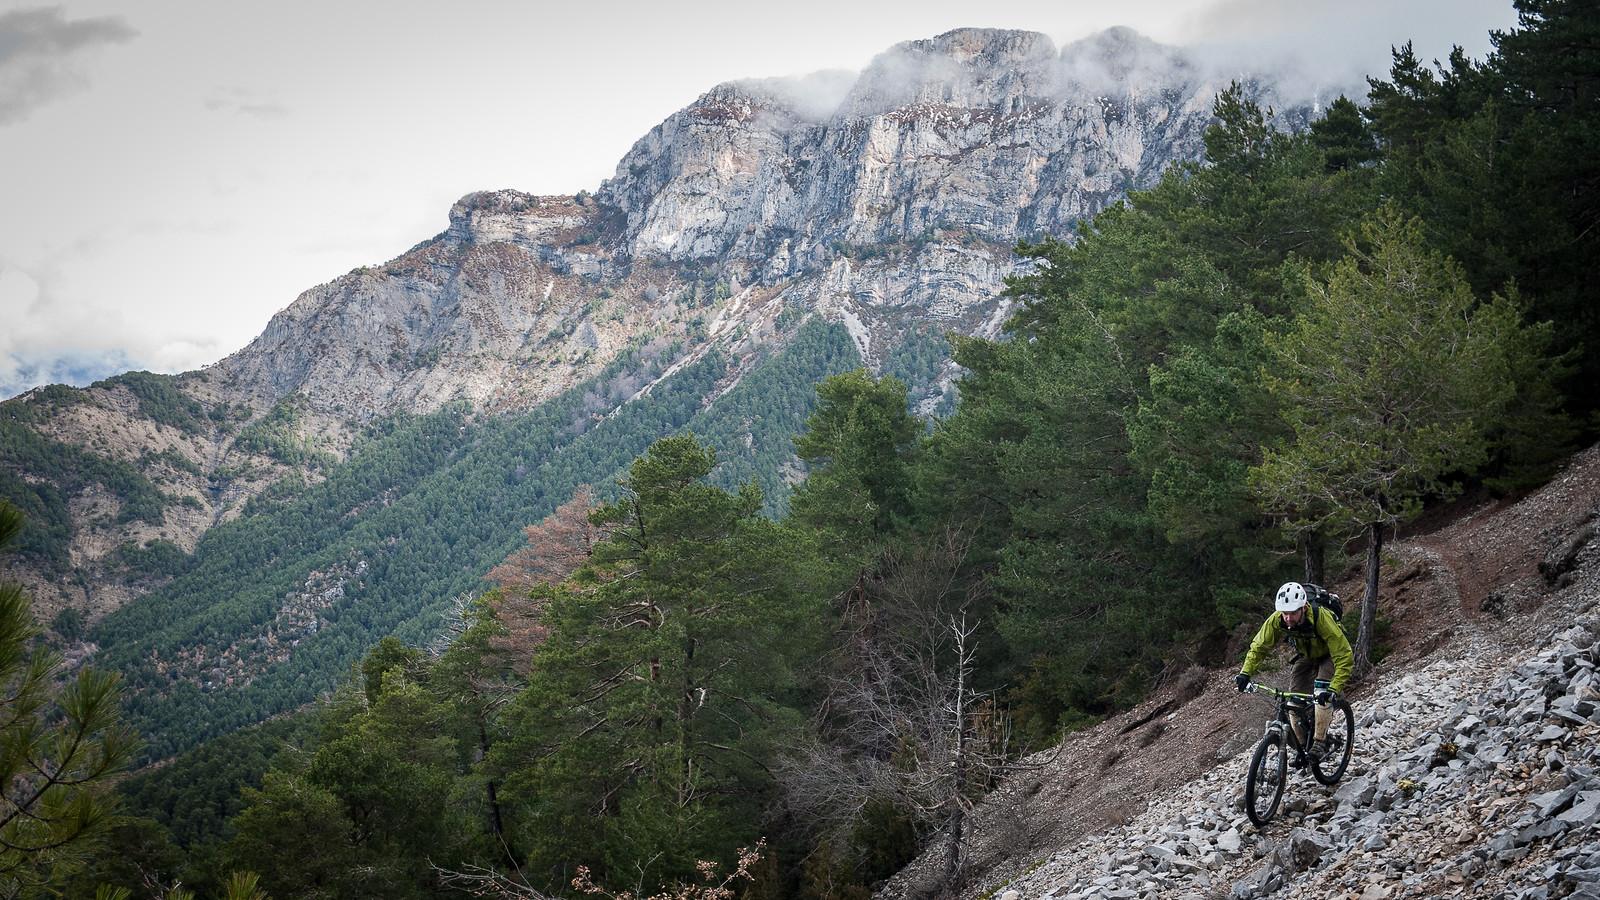 Pyrenees Mountain Biking - BasqueMTB - Mountain Biking Pictures - Vital MTB